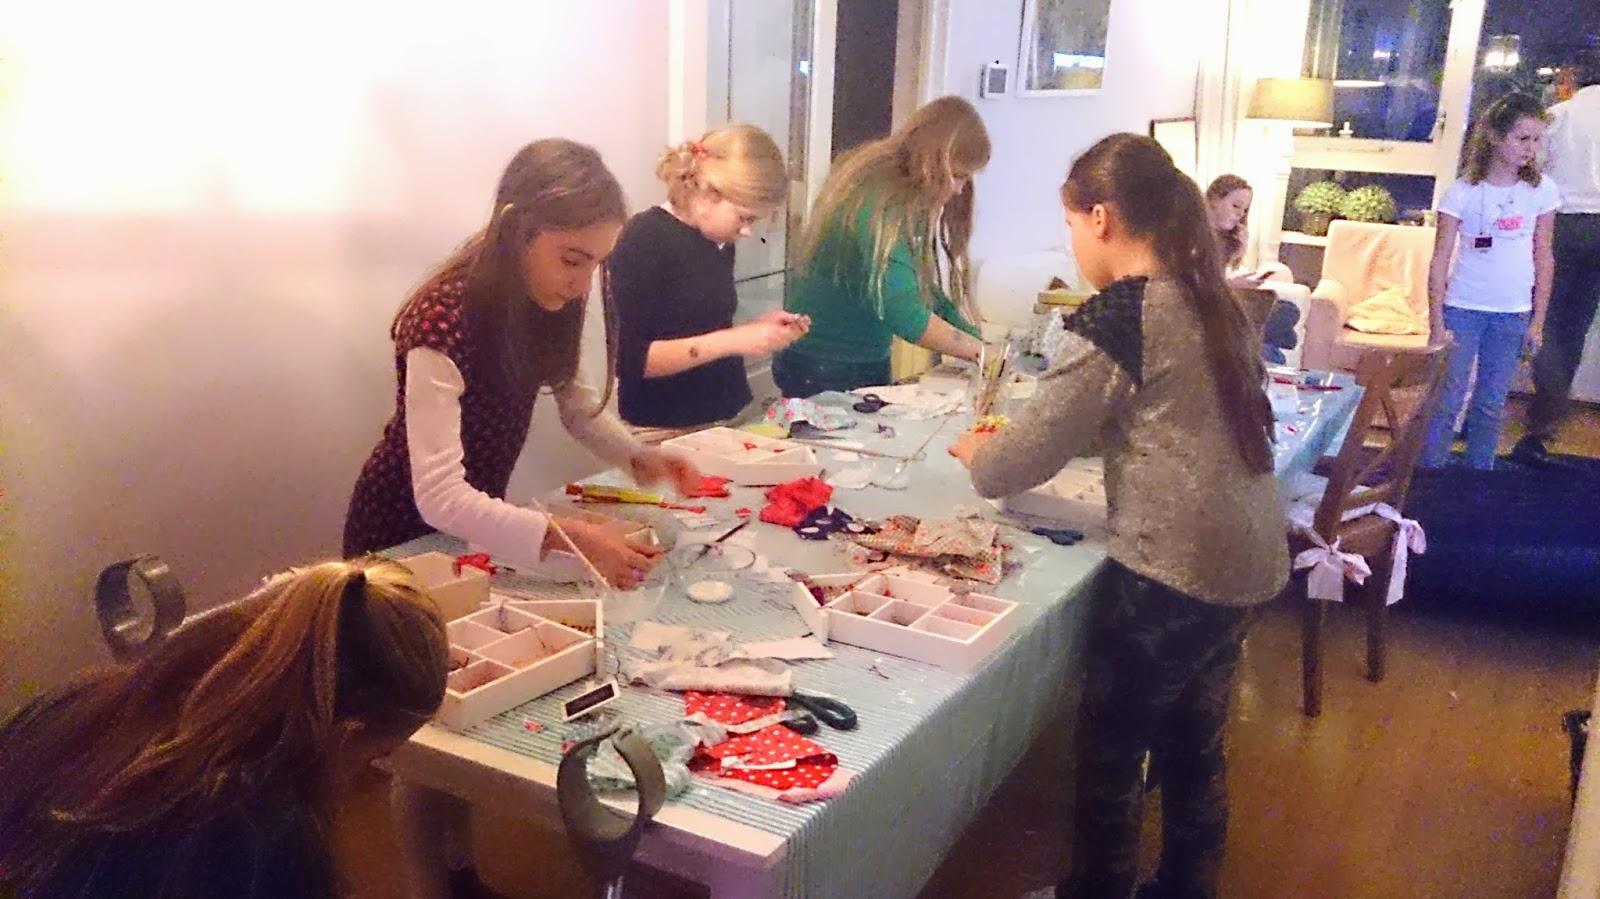 Collie collie: workshop letterbak versieren op bridget's kinderfeestje